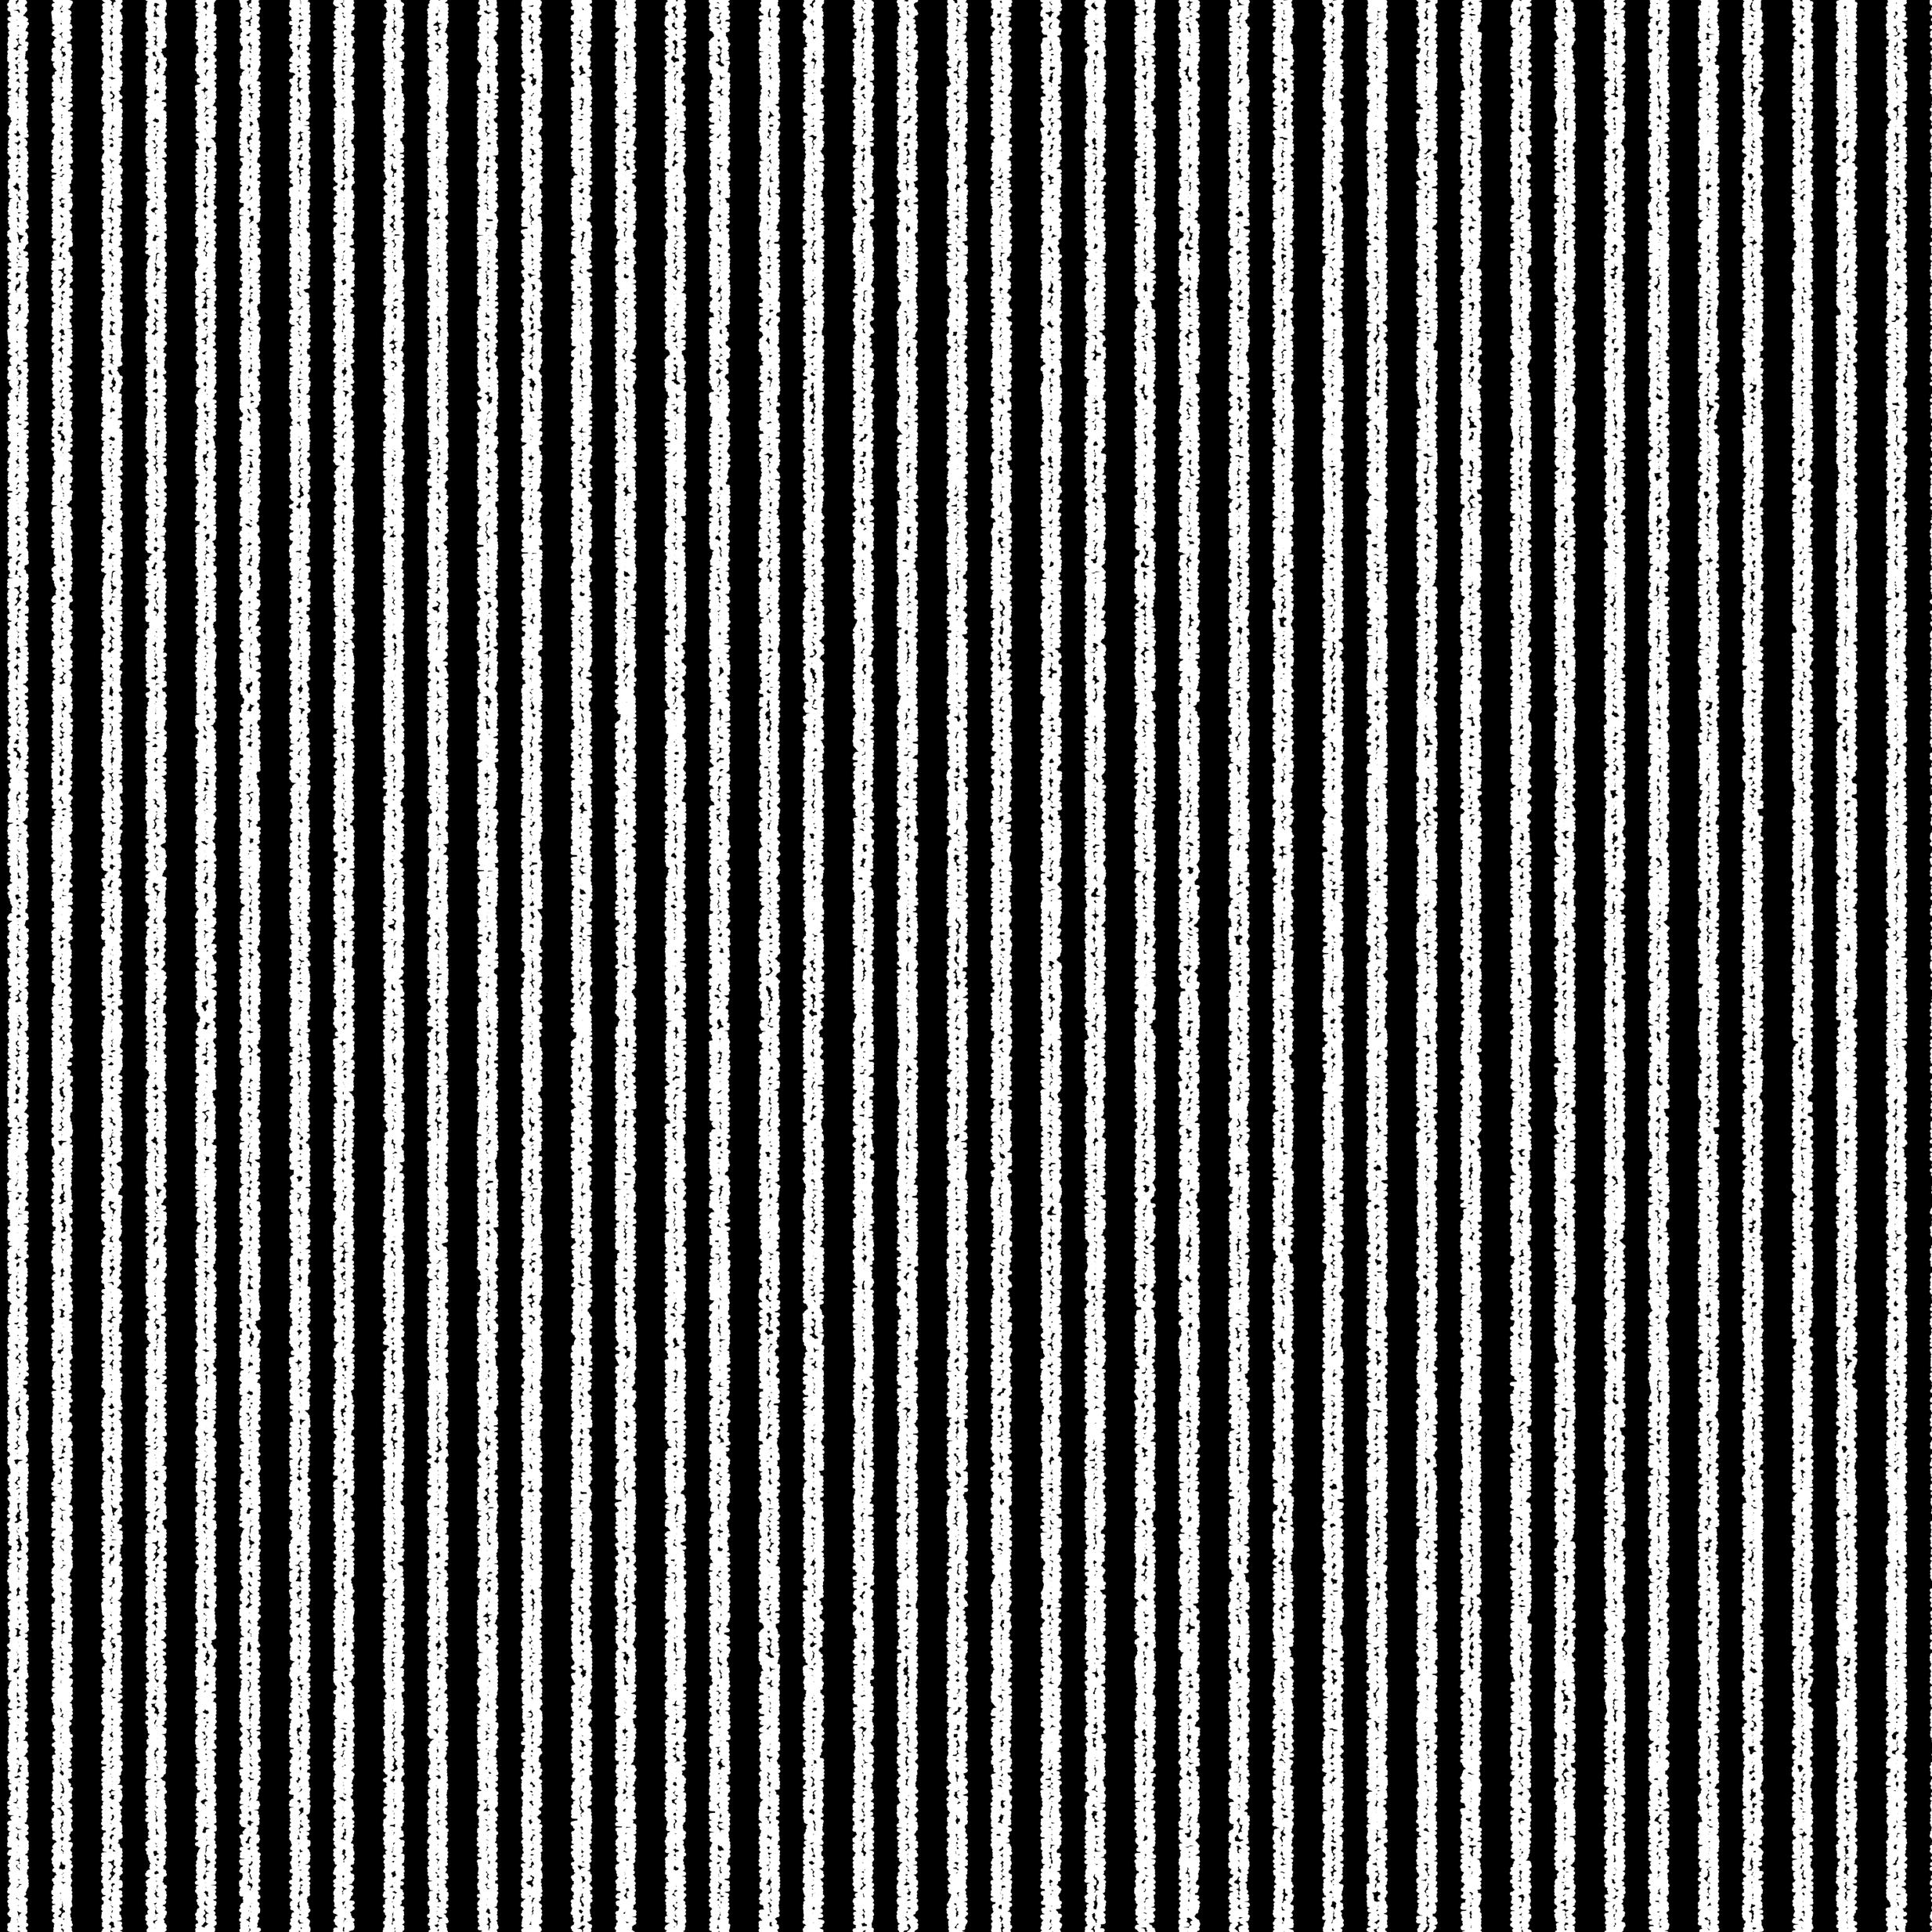 Organic stripes black-01-01 fabric by thepoonapple on Spoonflower - custom fabric